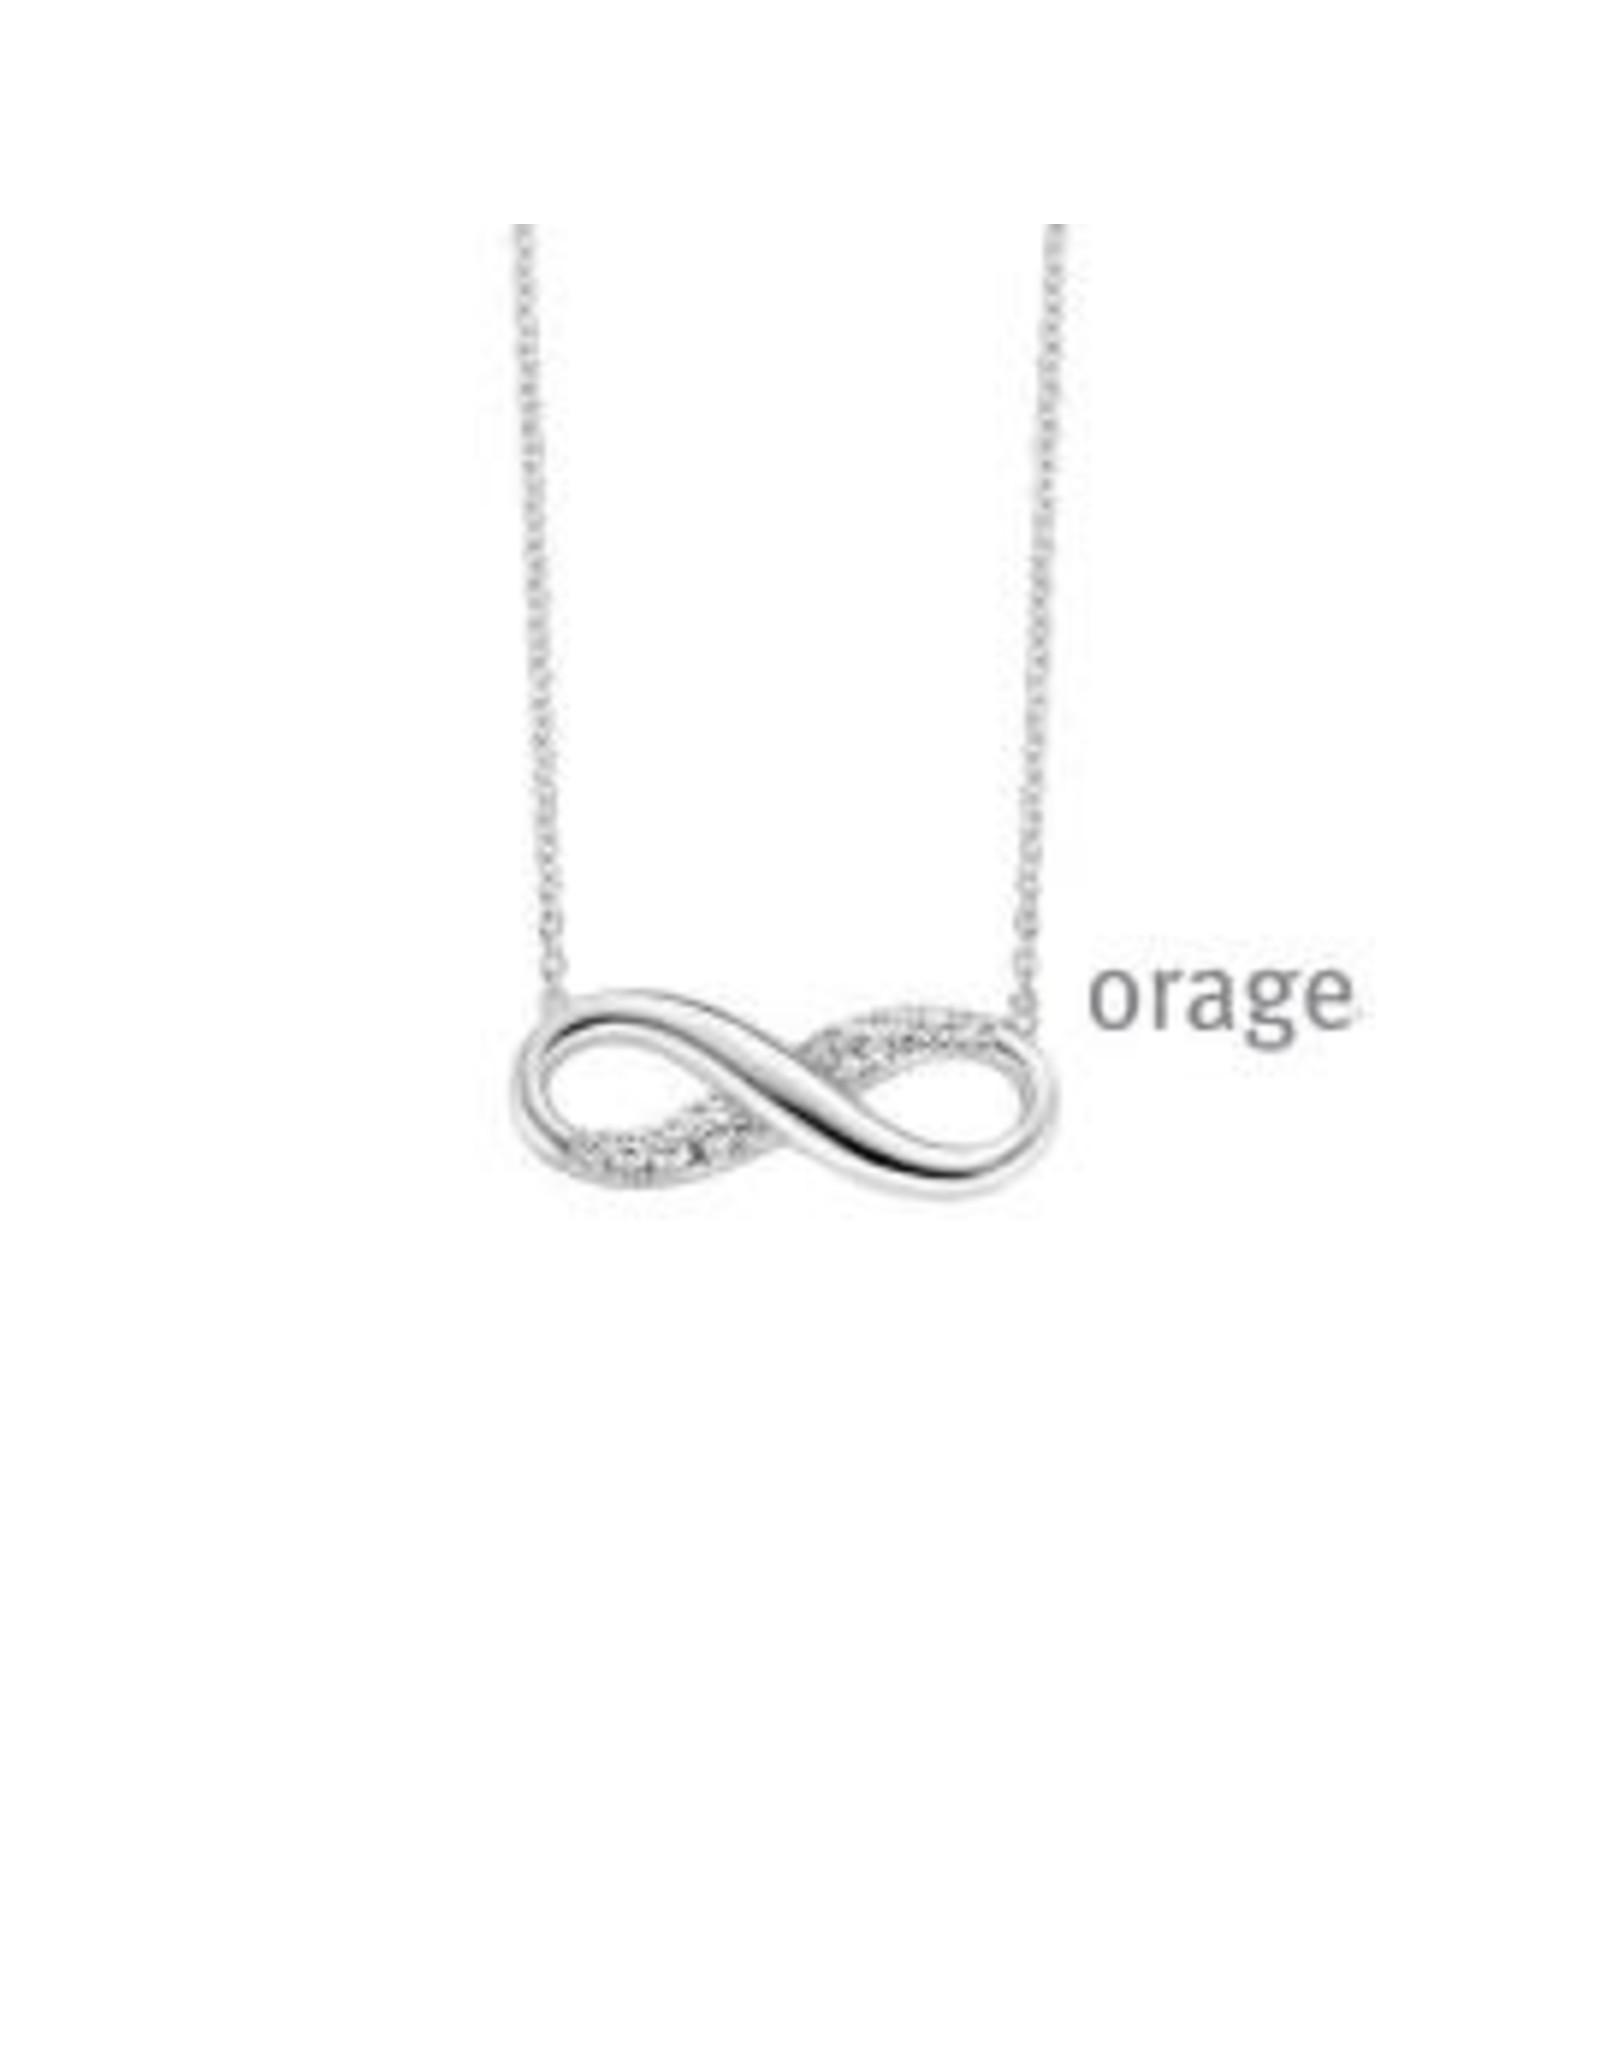 Orage Halsketting Zilver Orage V1413 Infinity